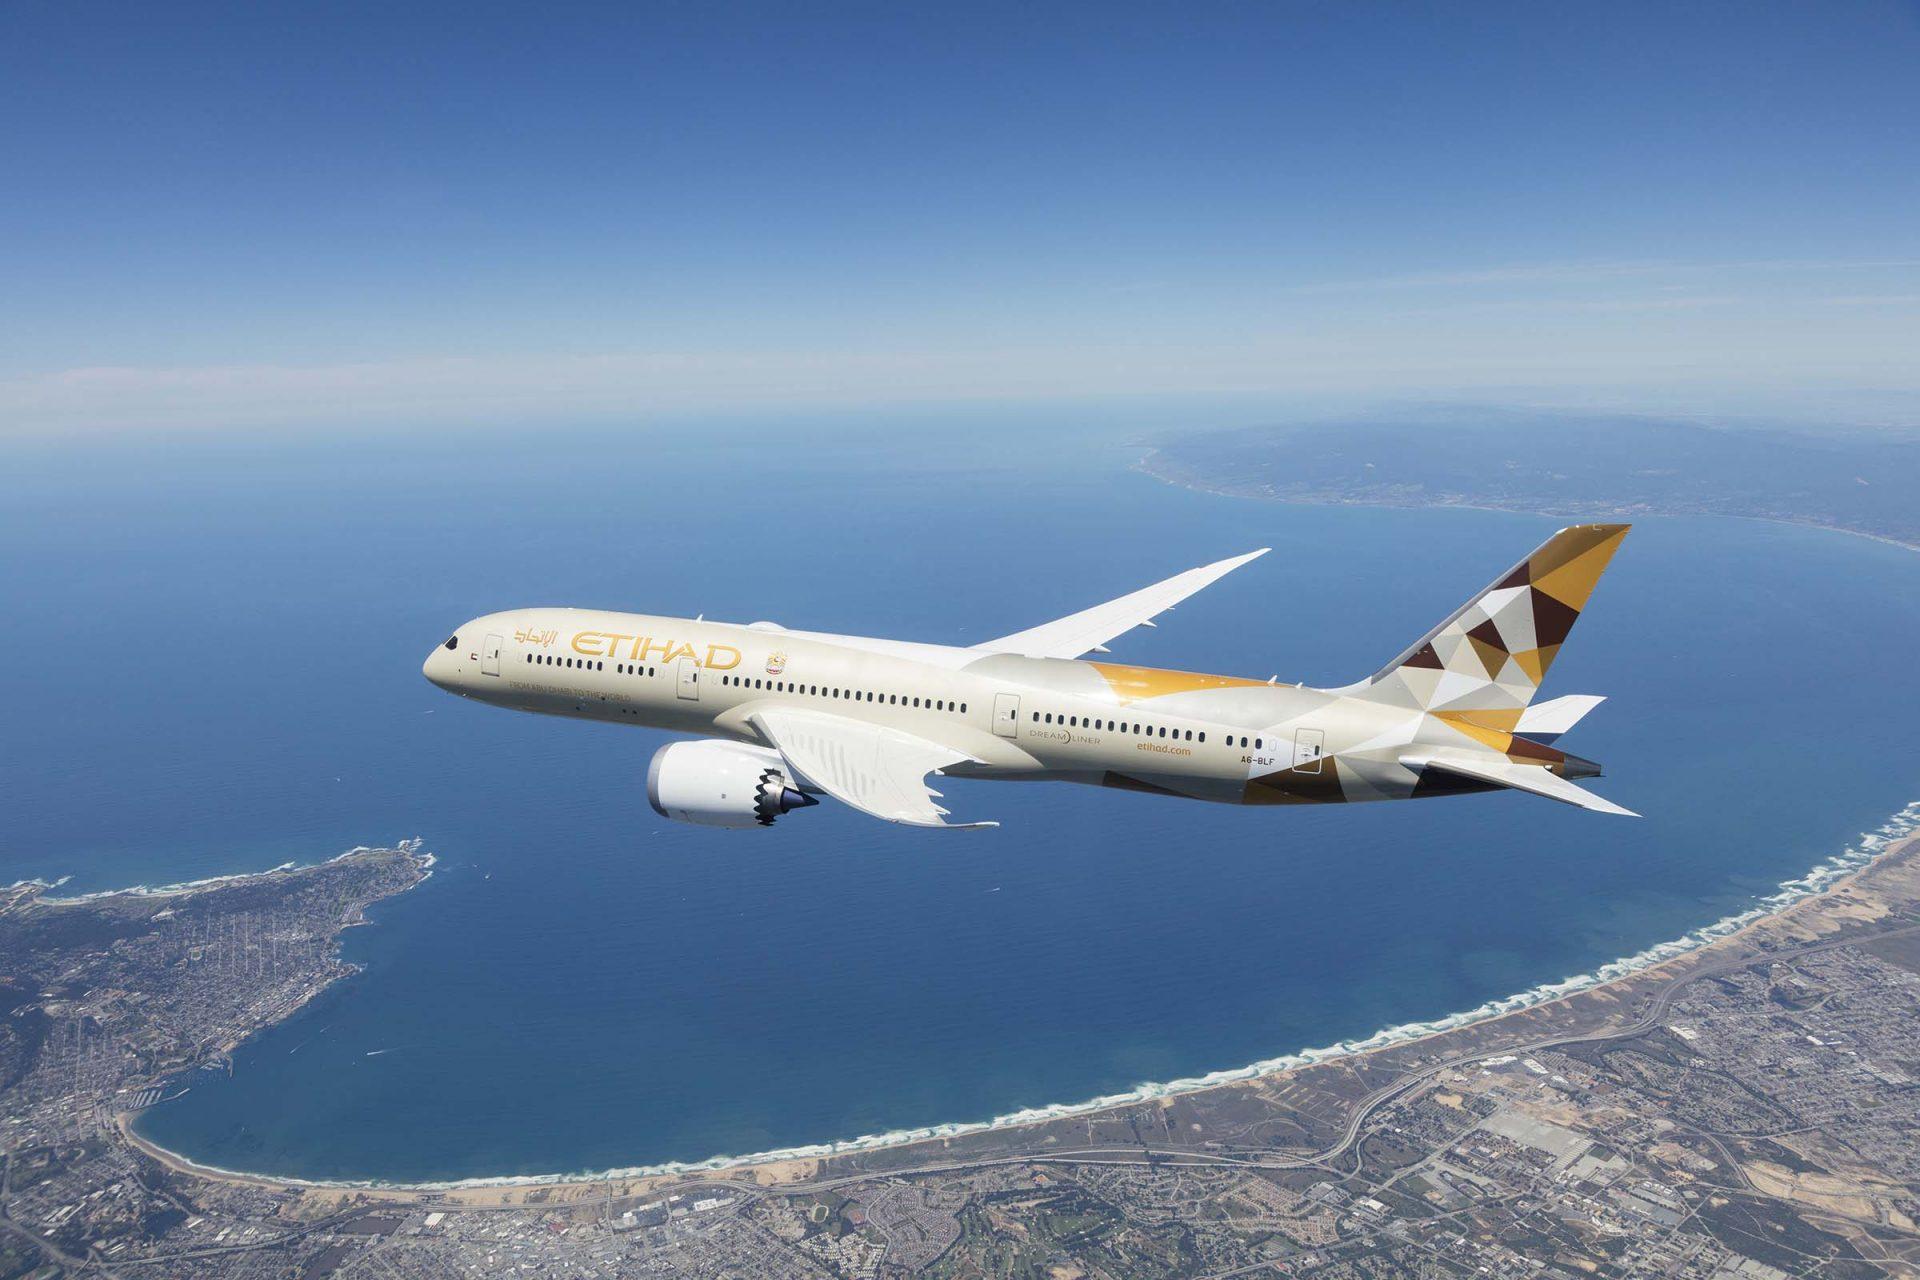 Etihad Airways will begin flights from Abu Dhabi to Tel Aviv